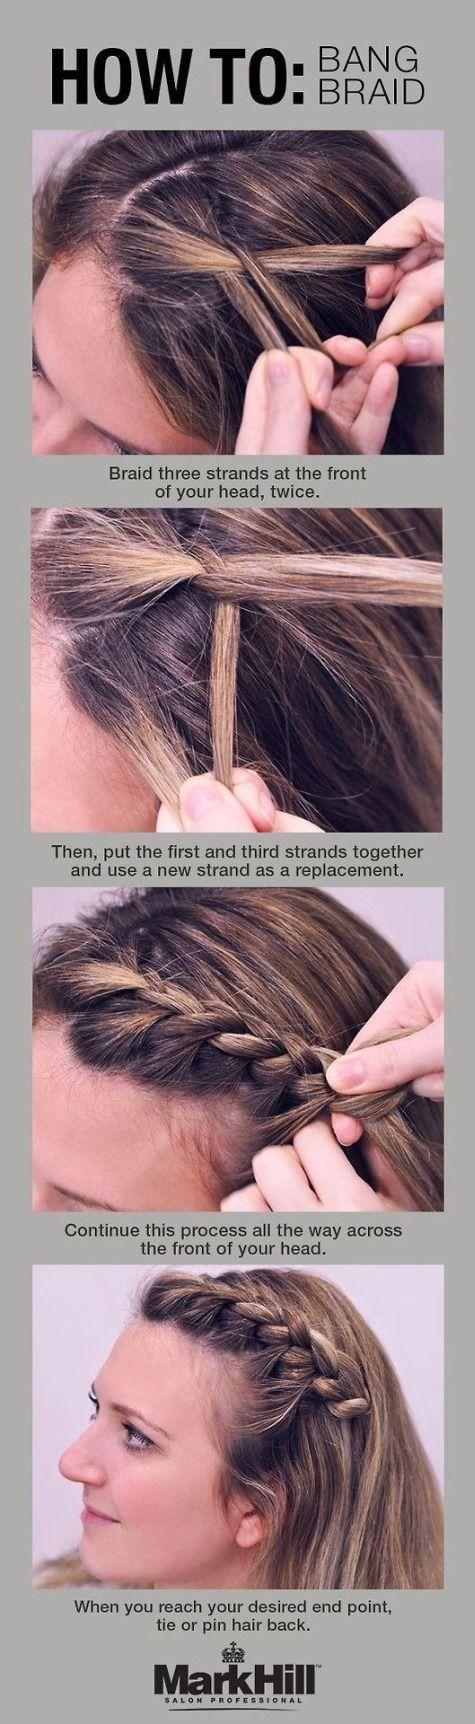 braid tips tricks